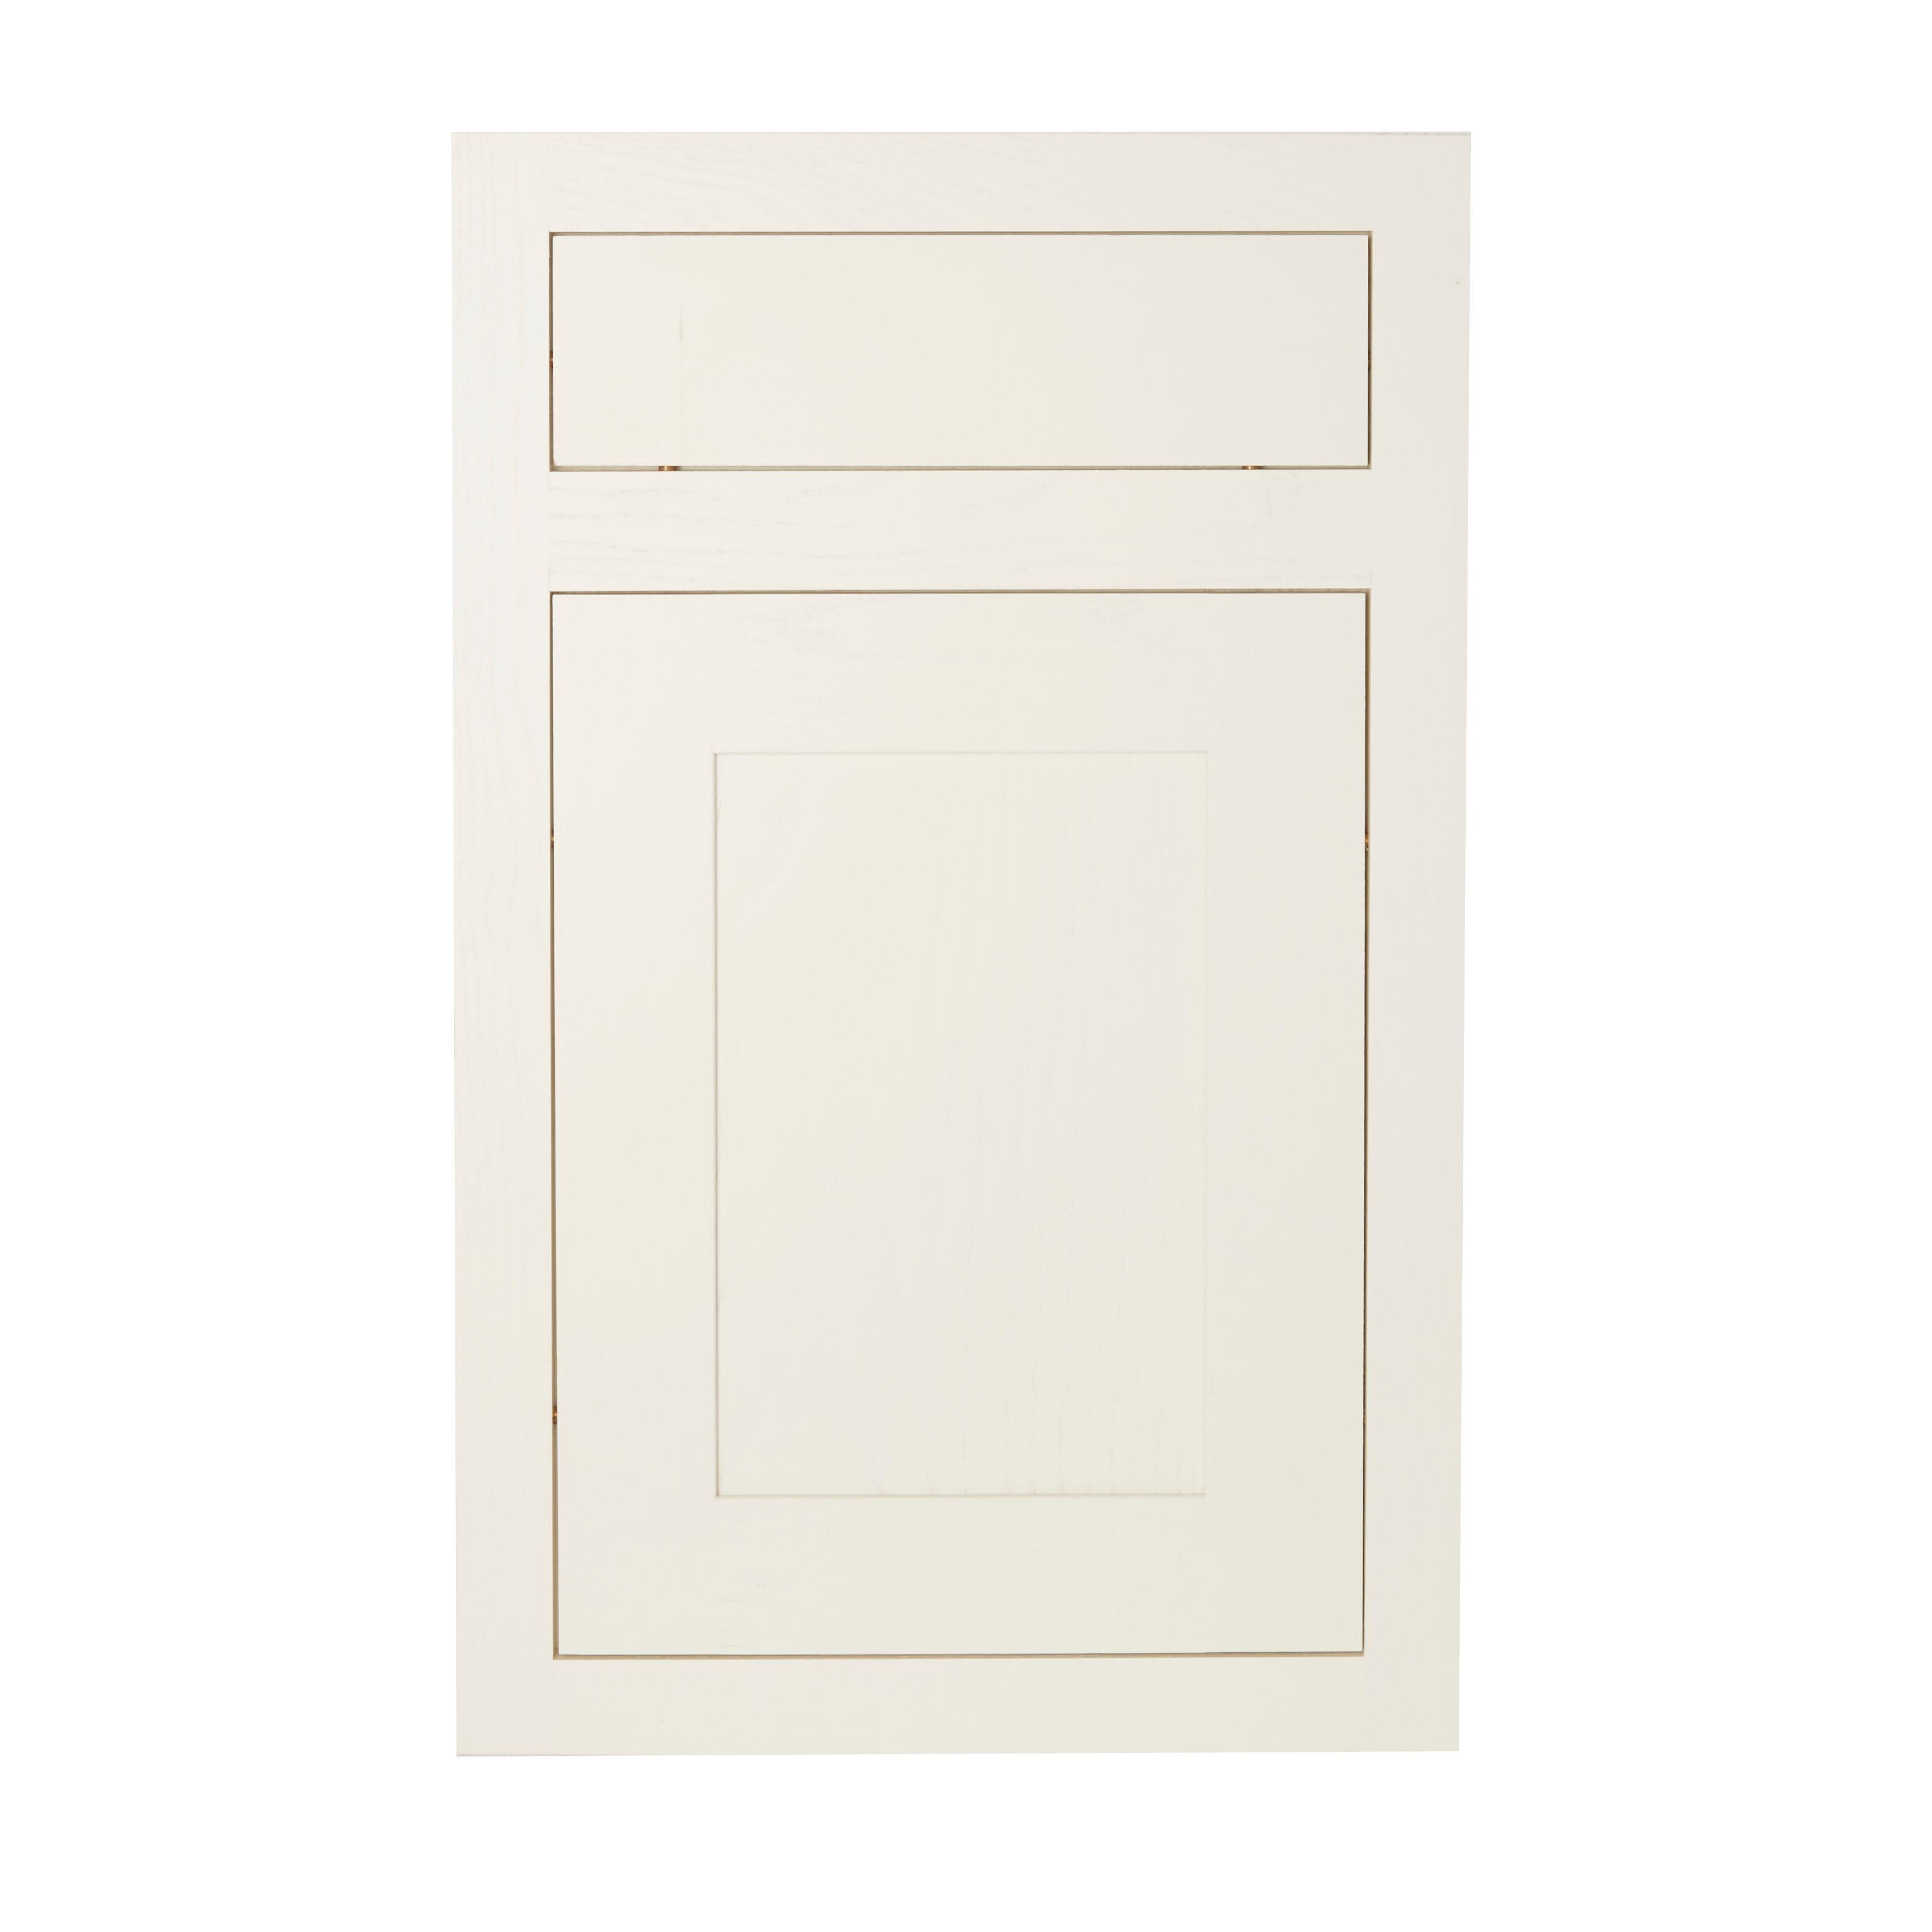 B Q Kitchen Cabinet Doors: Cooke & Lewis Carisbrooke Ivory Fixed Frame Cabinet Door